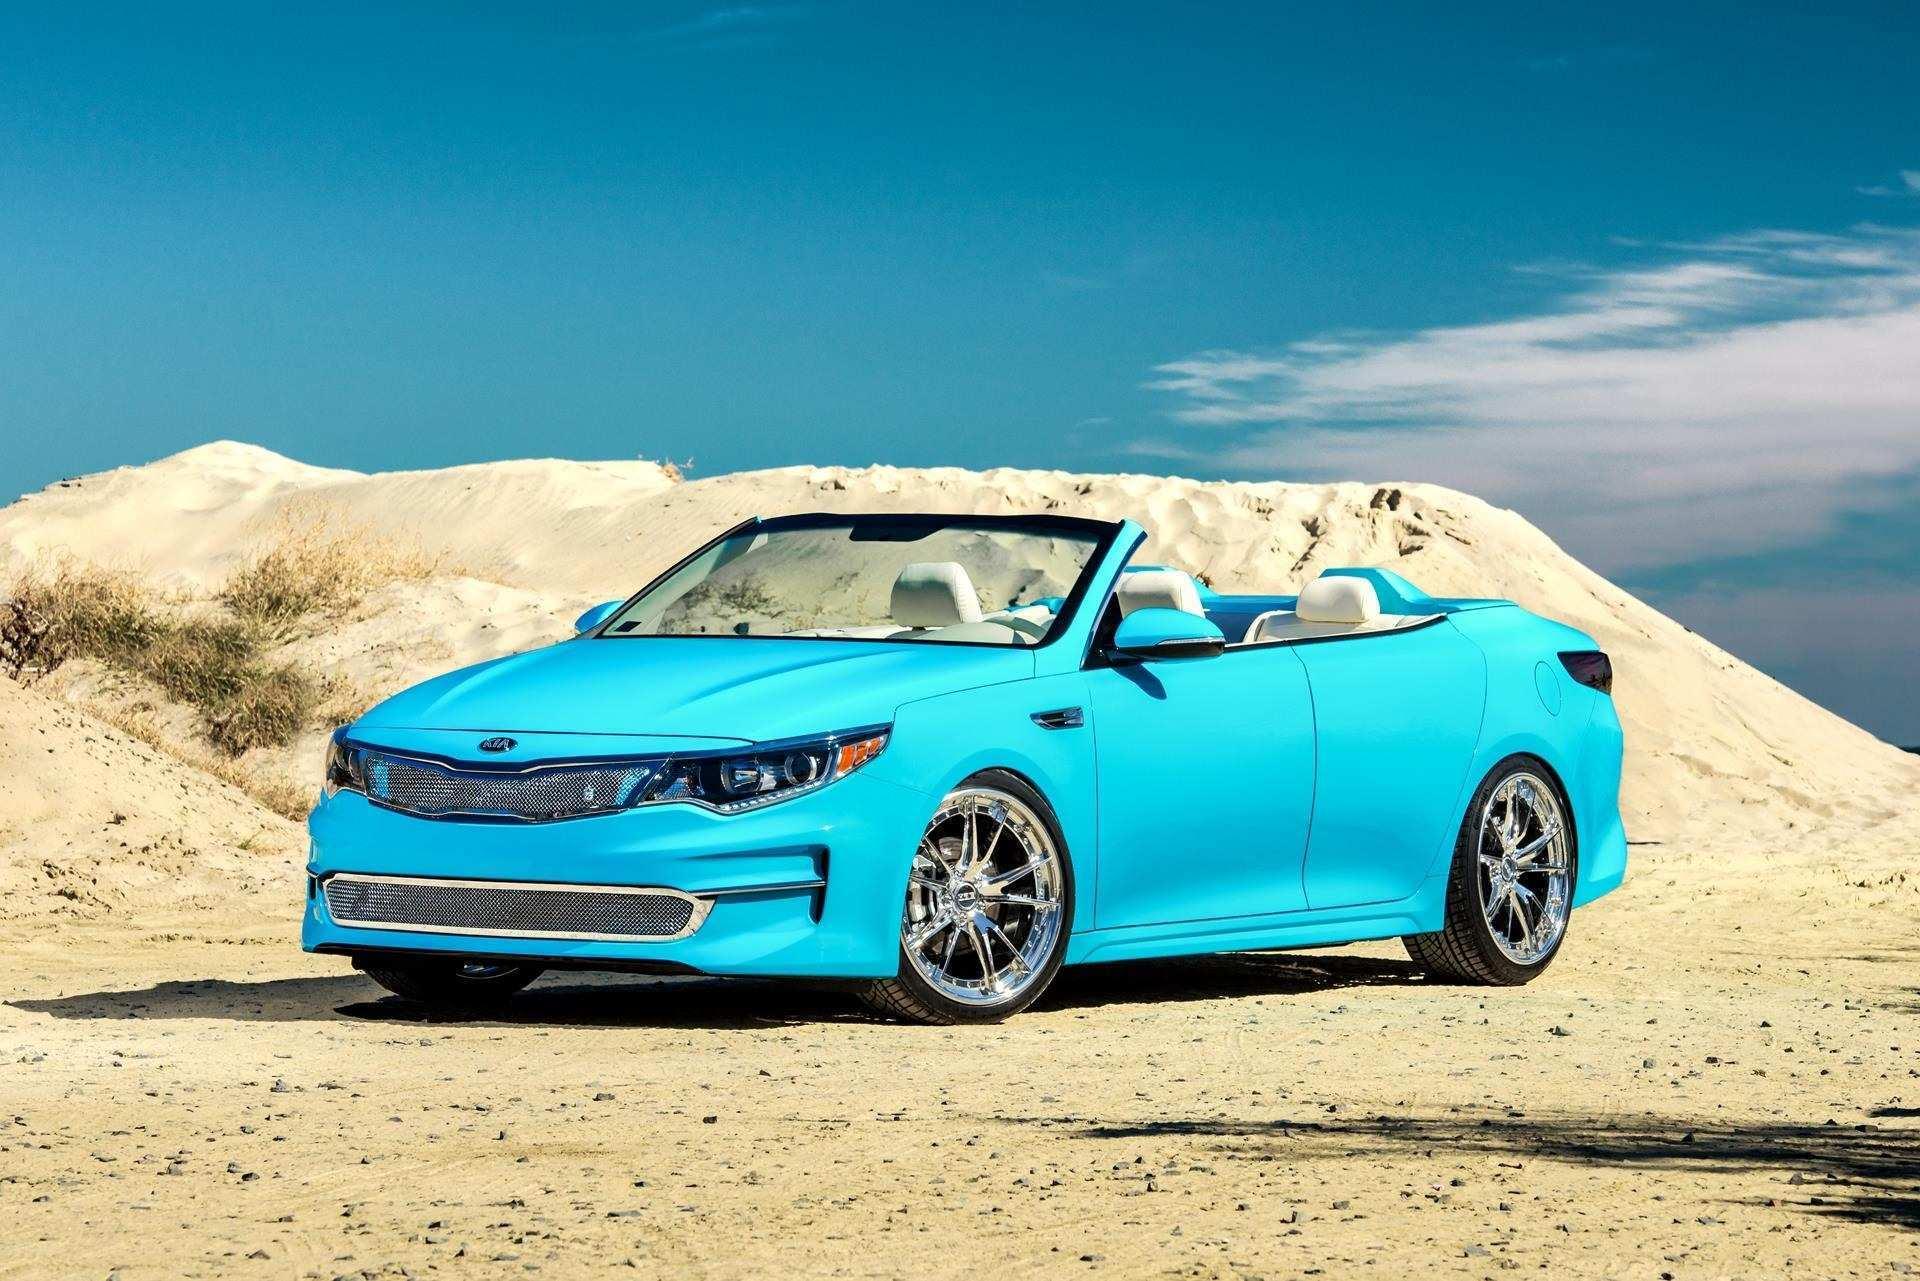 21 Best Review 2020 Kia Optima Performance for 2020 Kia Optima